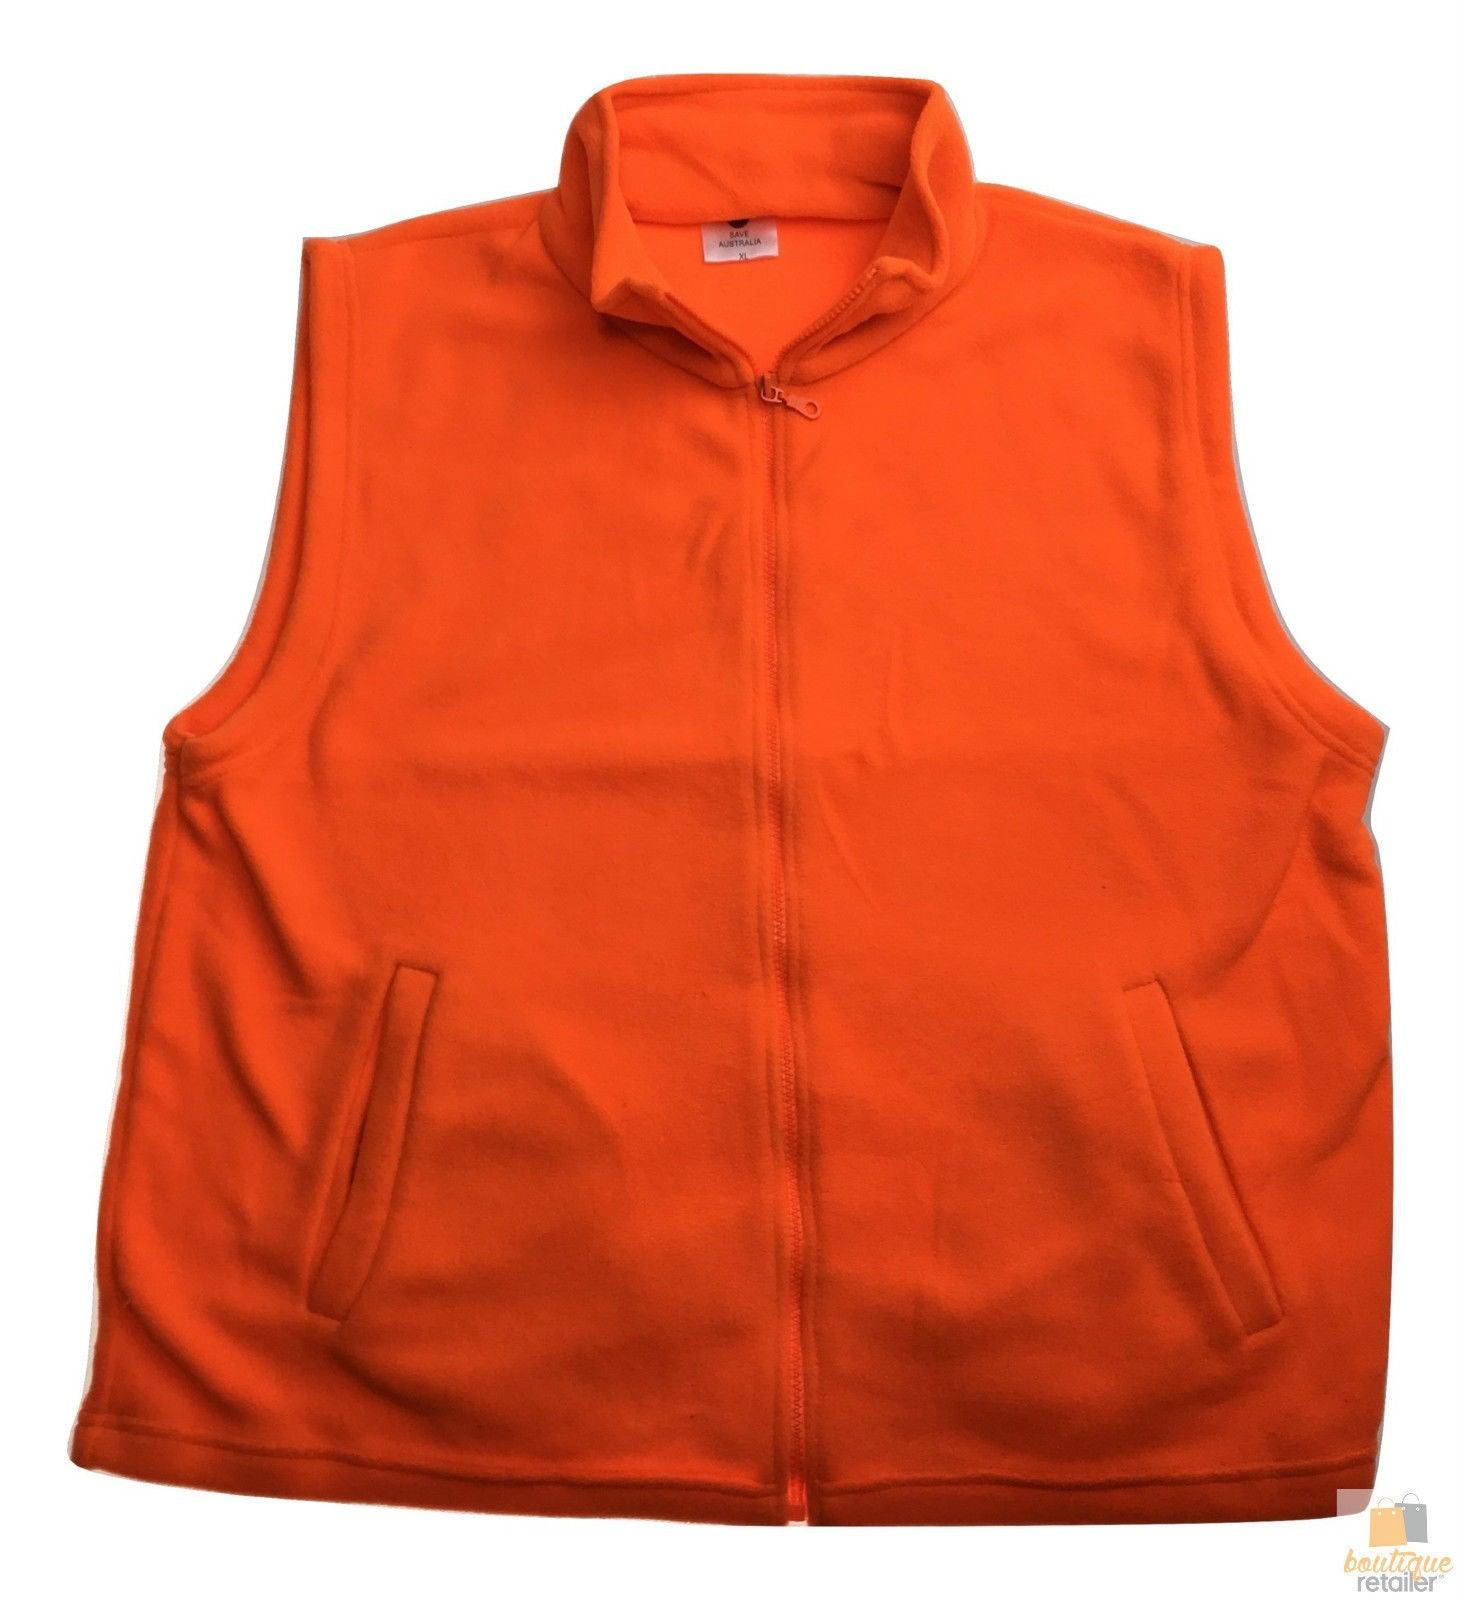 PLAIN HI VIS Polar Fleece Vest Full Zip Safety Workwear High Visibility Fleecy